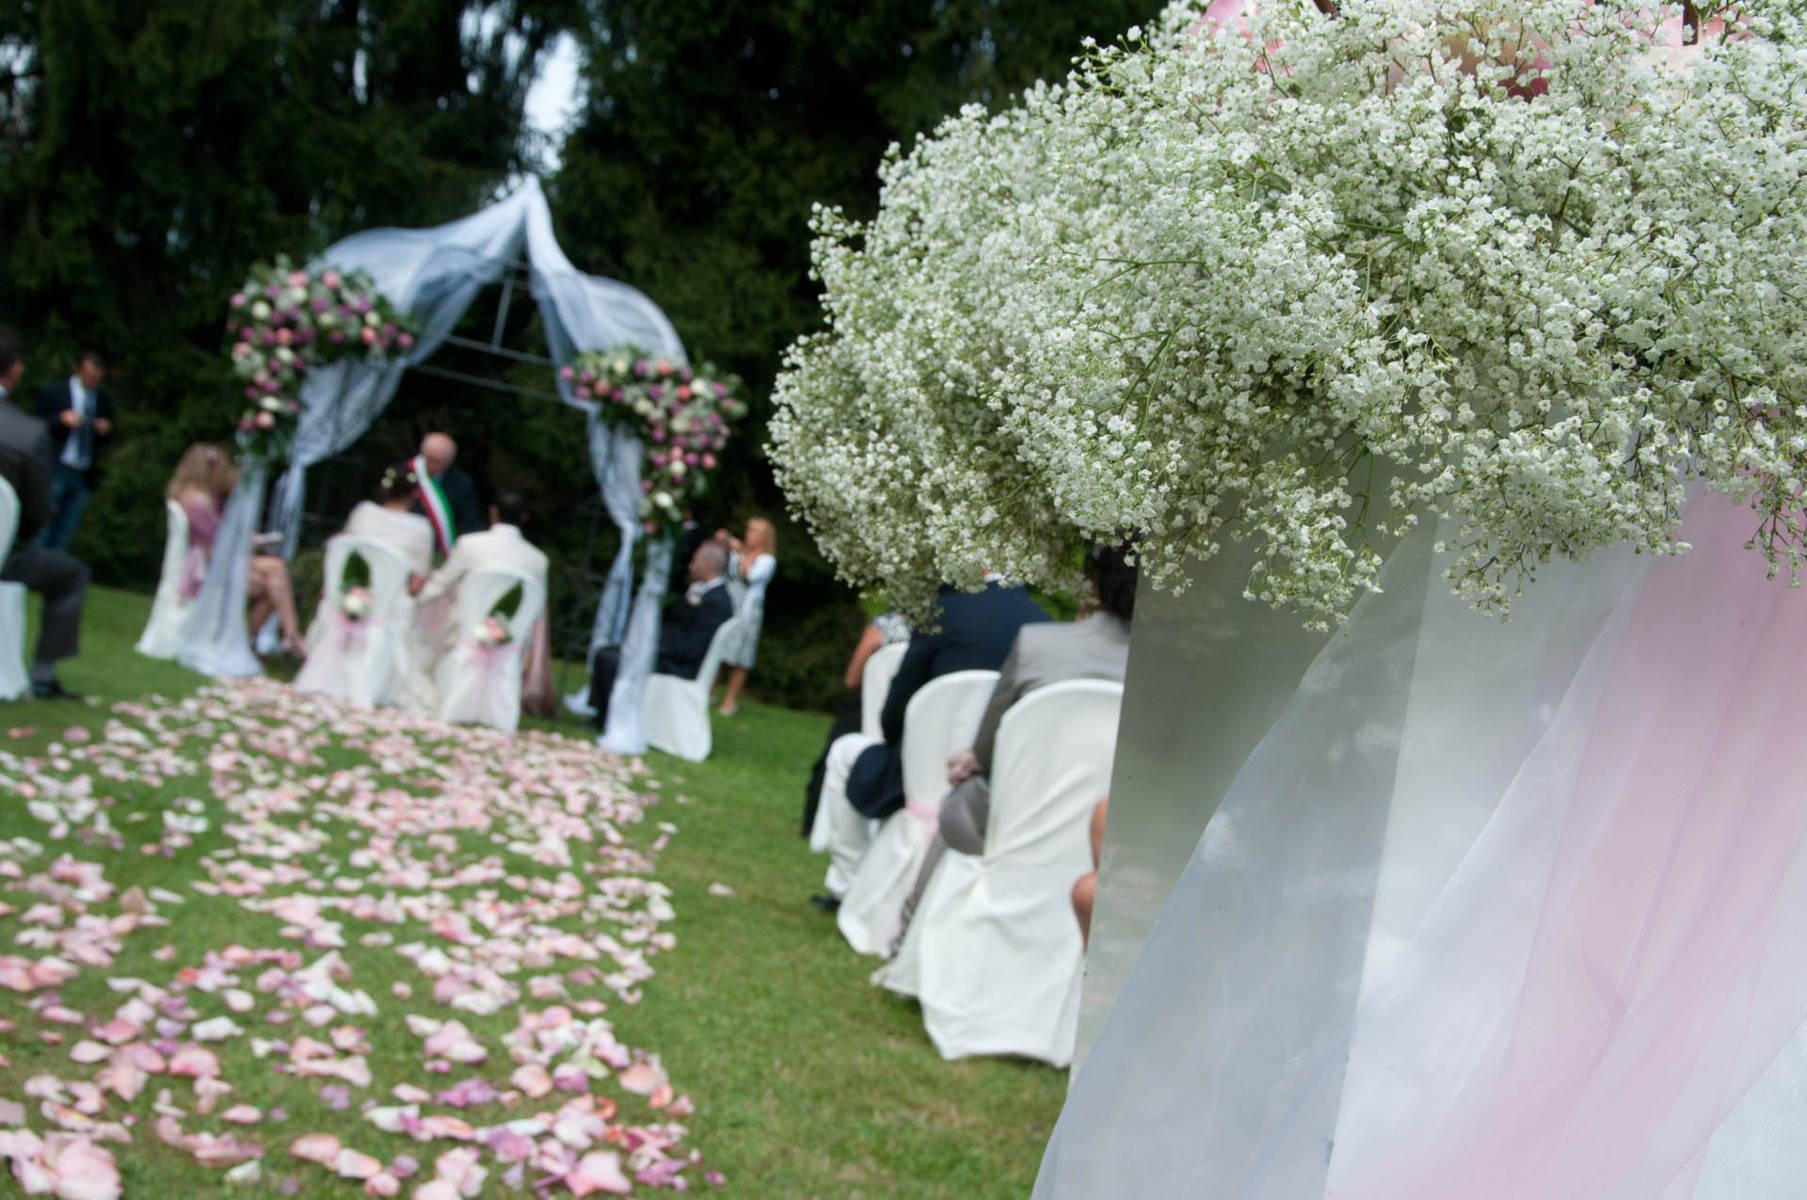 Addobbi Per Matrimonio In Giardino : Addobbi floreali per matrimoni ed eventi milano e varese